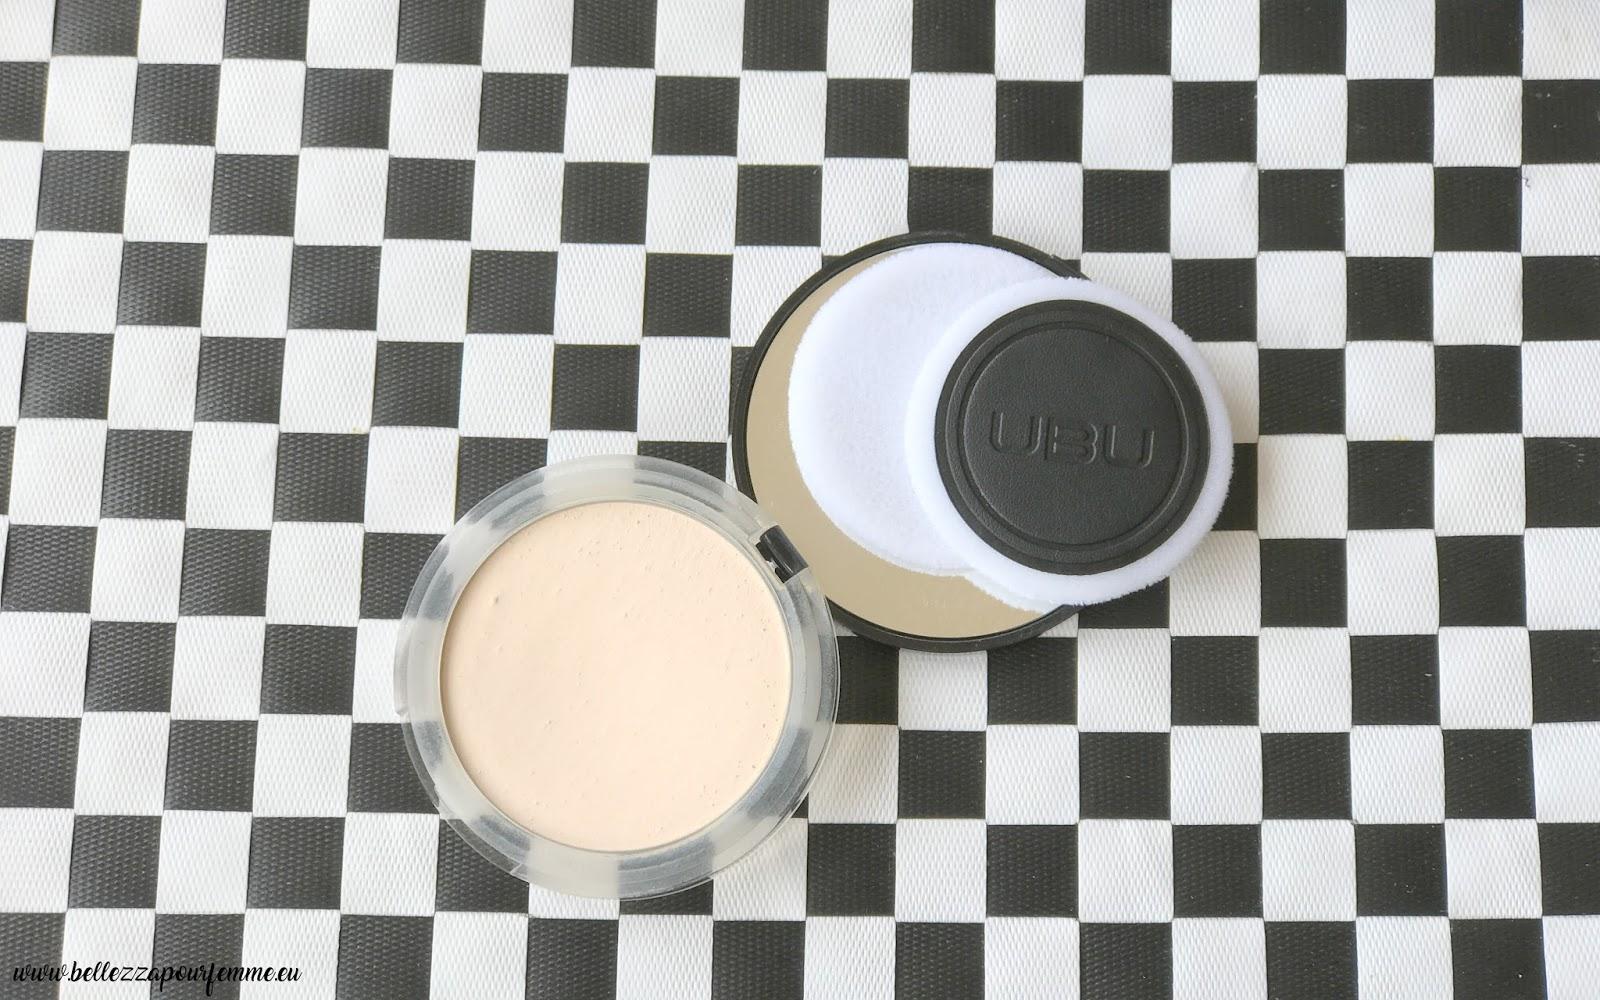 Makeup Sponges UBU